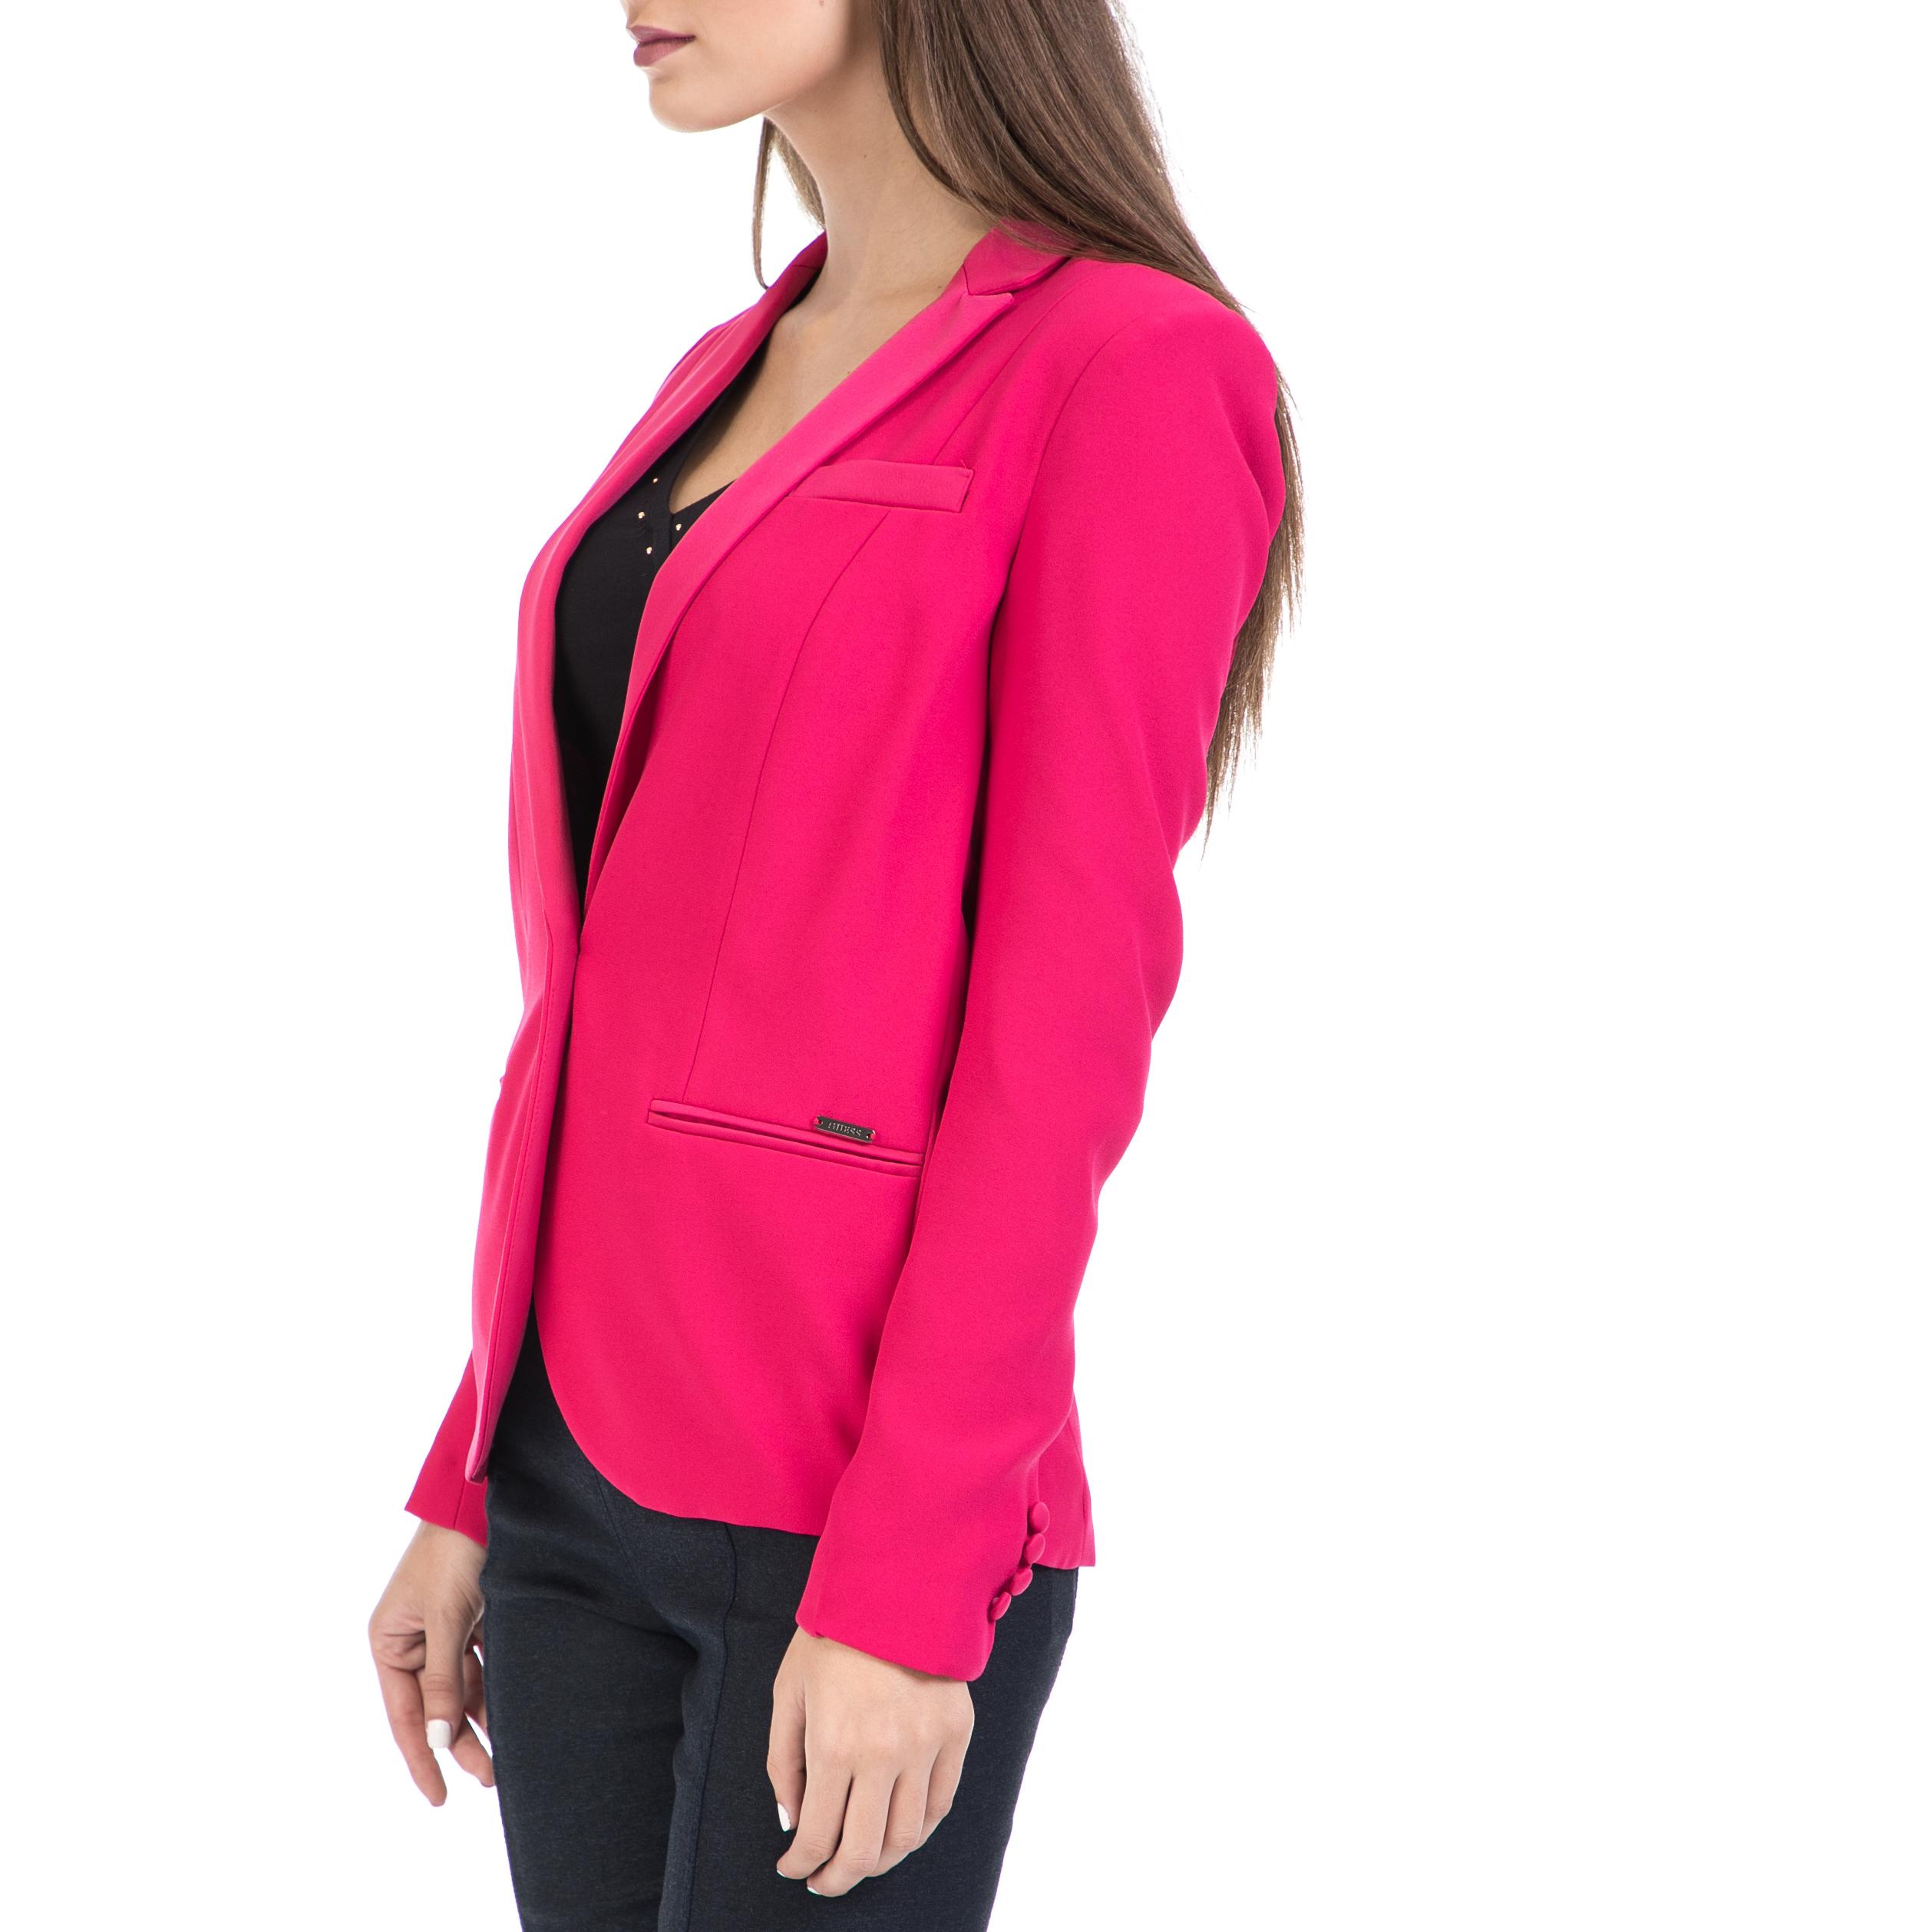 981500ceabb0 GUESS - Γυναικείο σακάκι GUESS ροζ